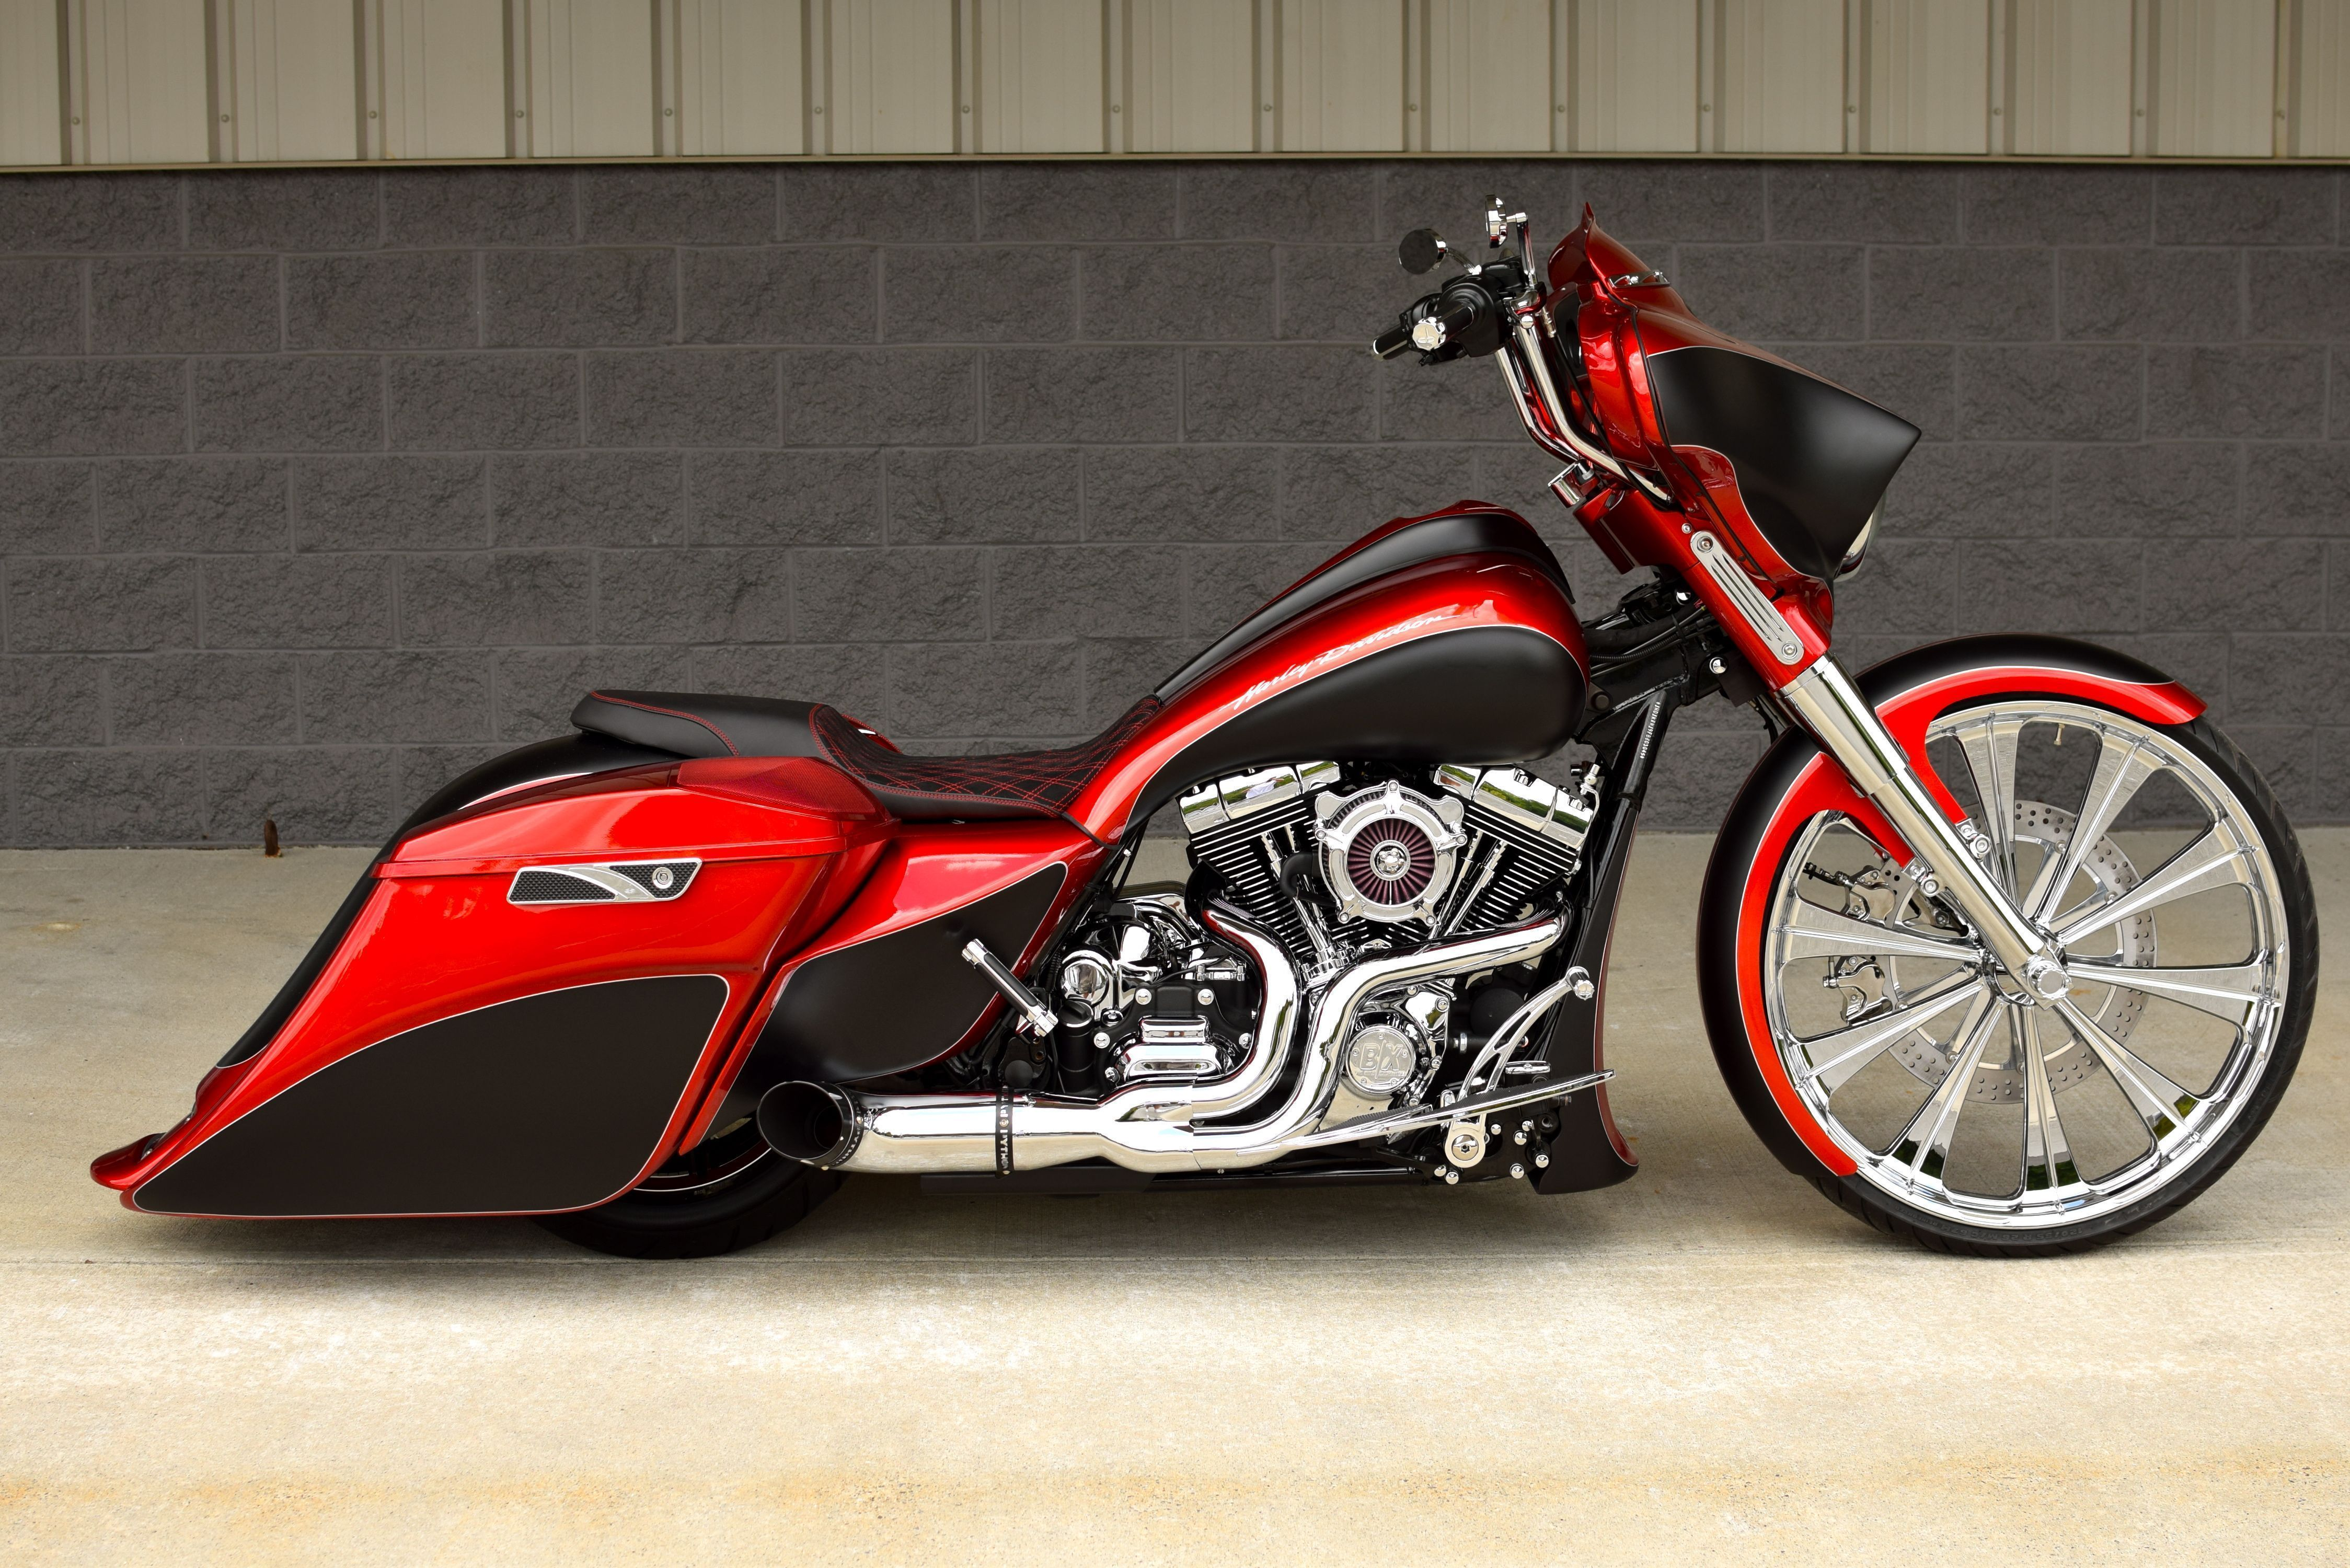 2015 Harley Davidson Street Glide Special 26 Wheel